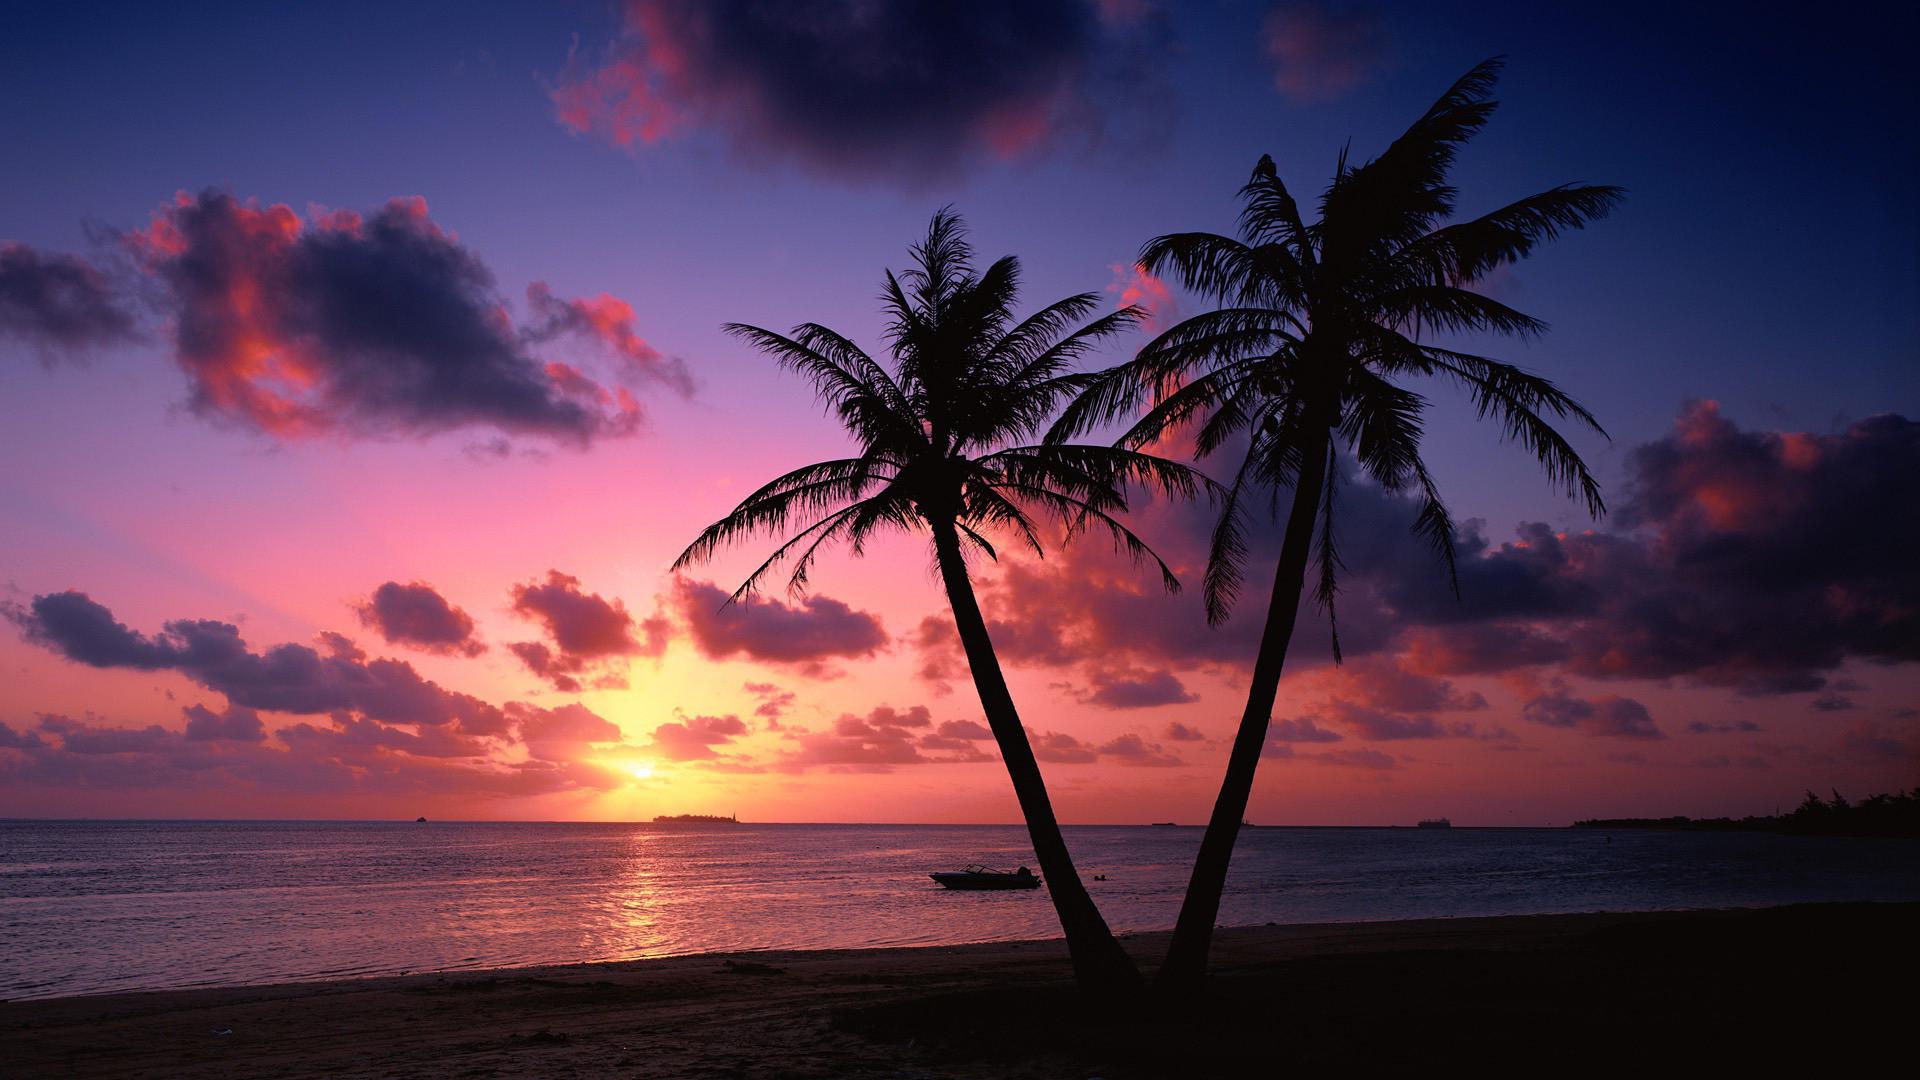 Sunset Tropical Beach